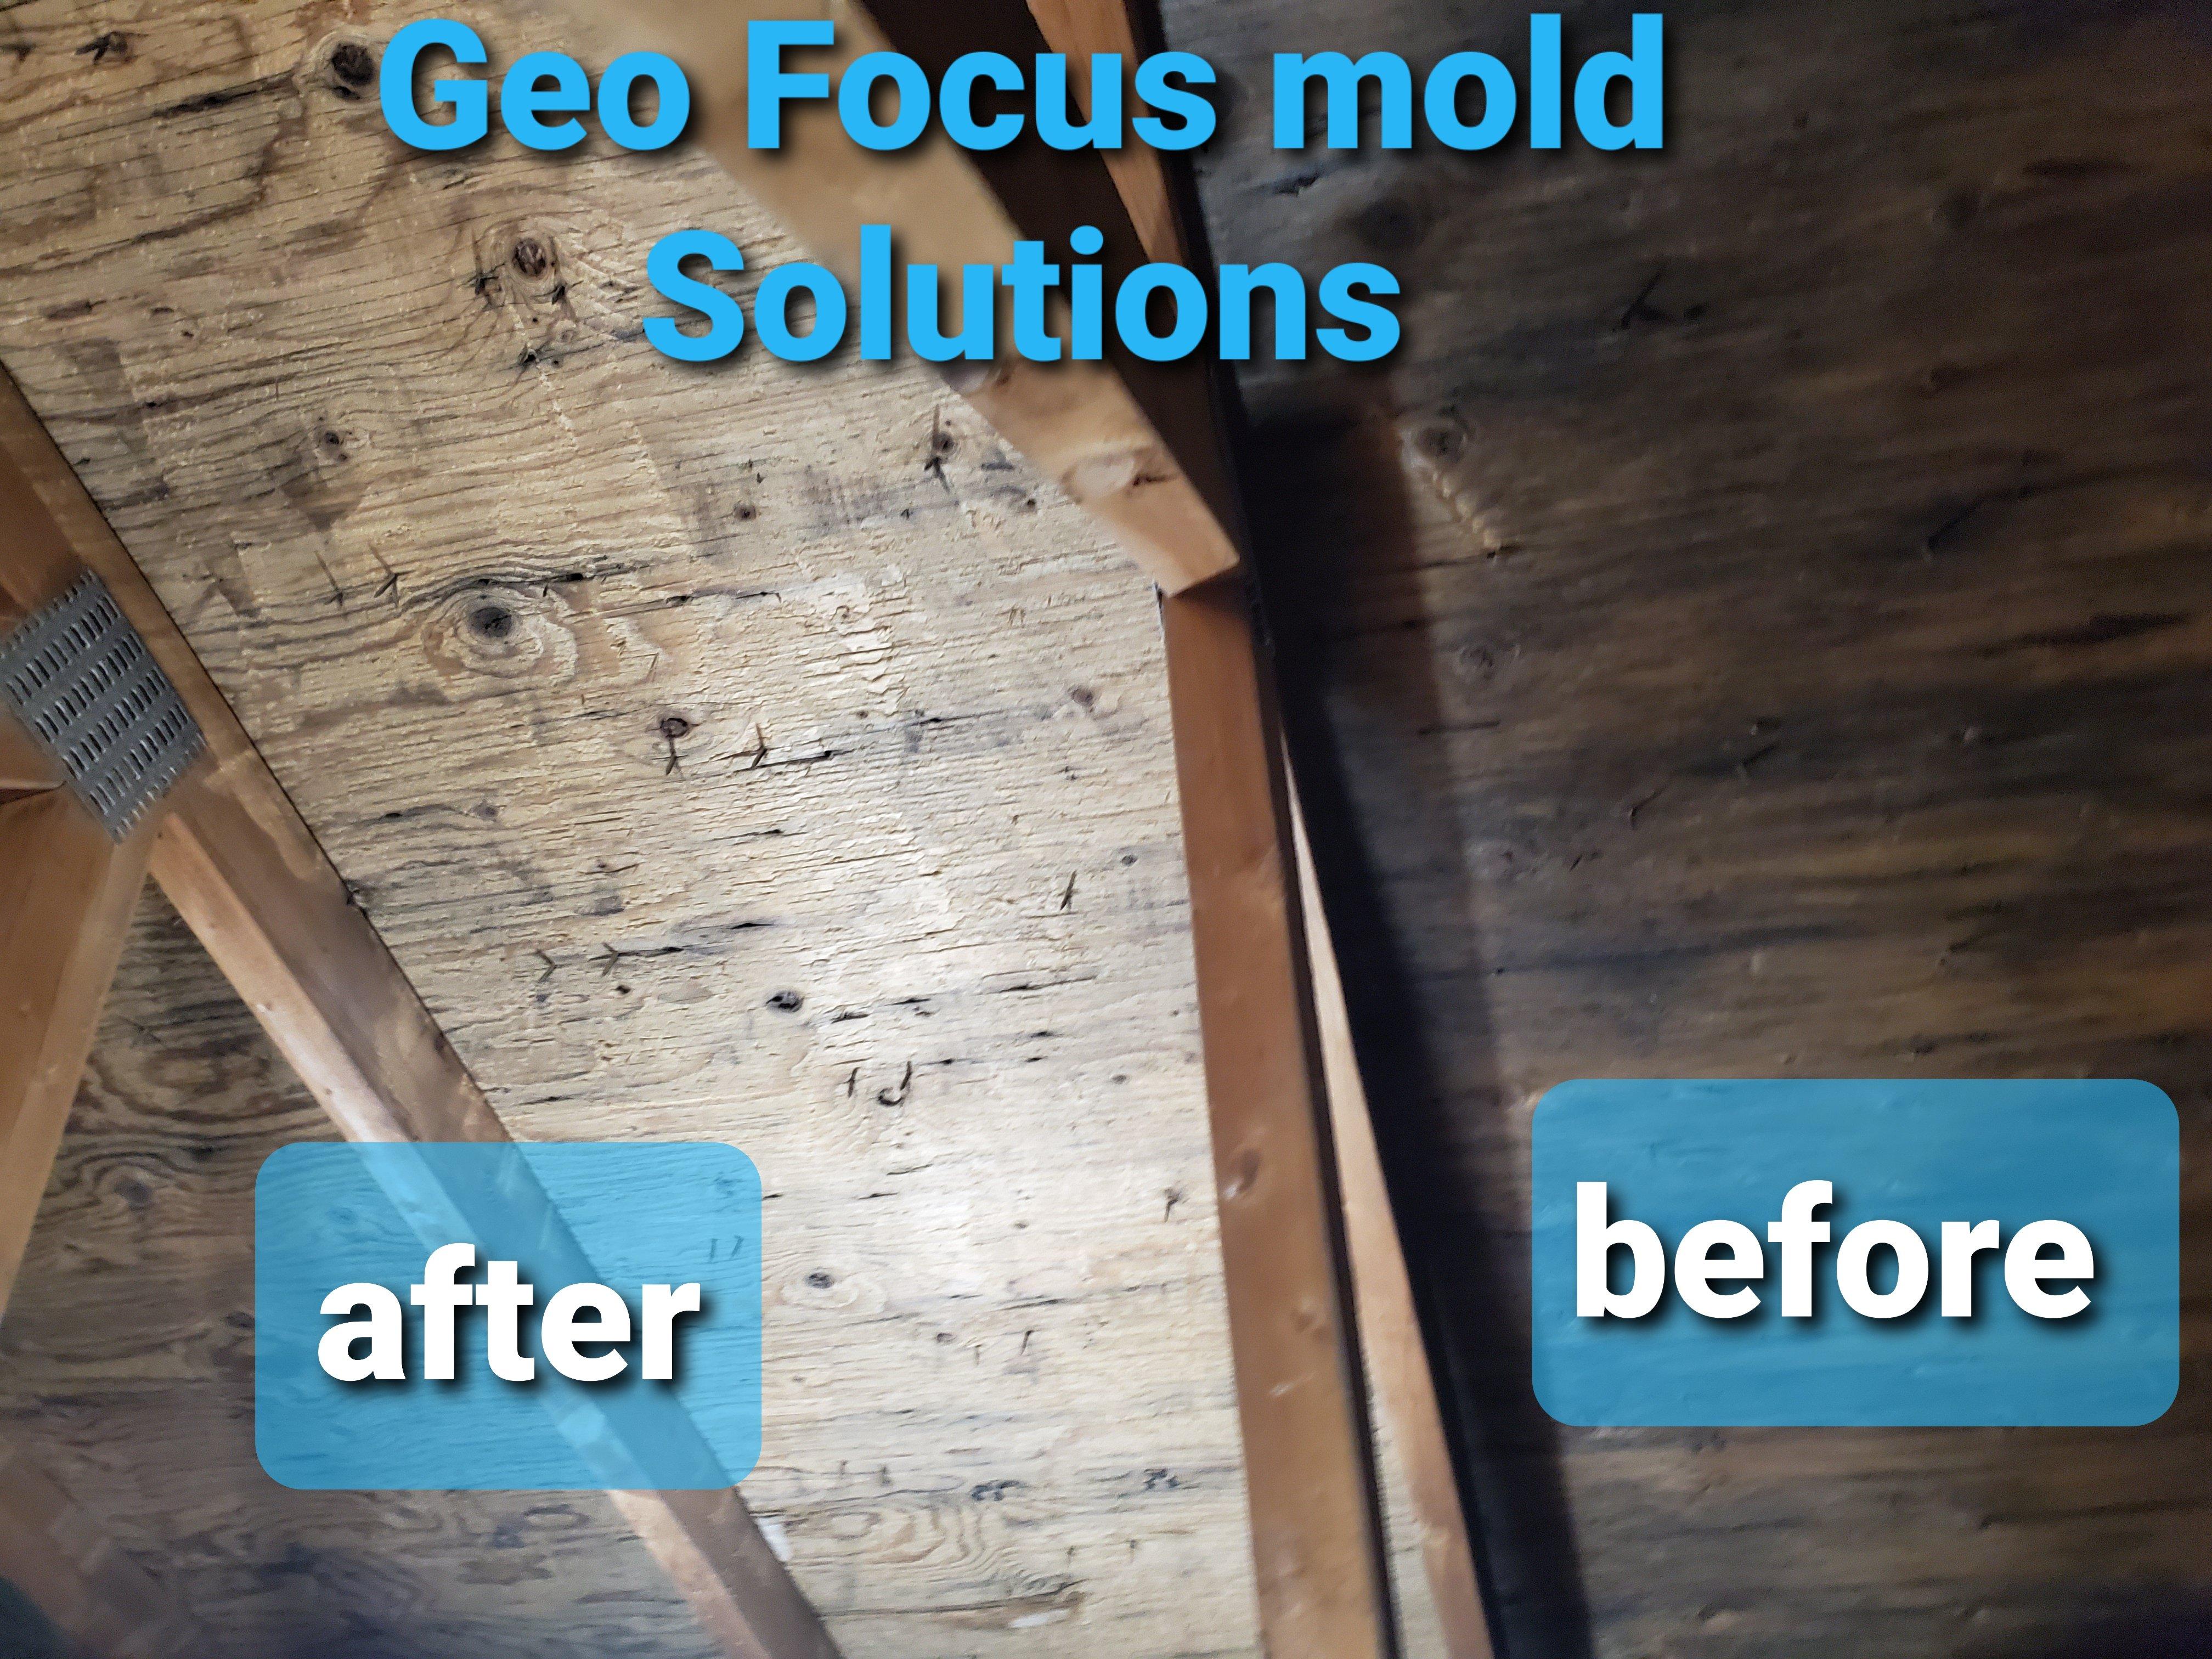 geofocus mold remediation